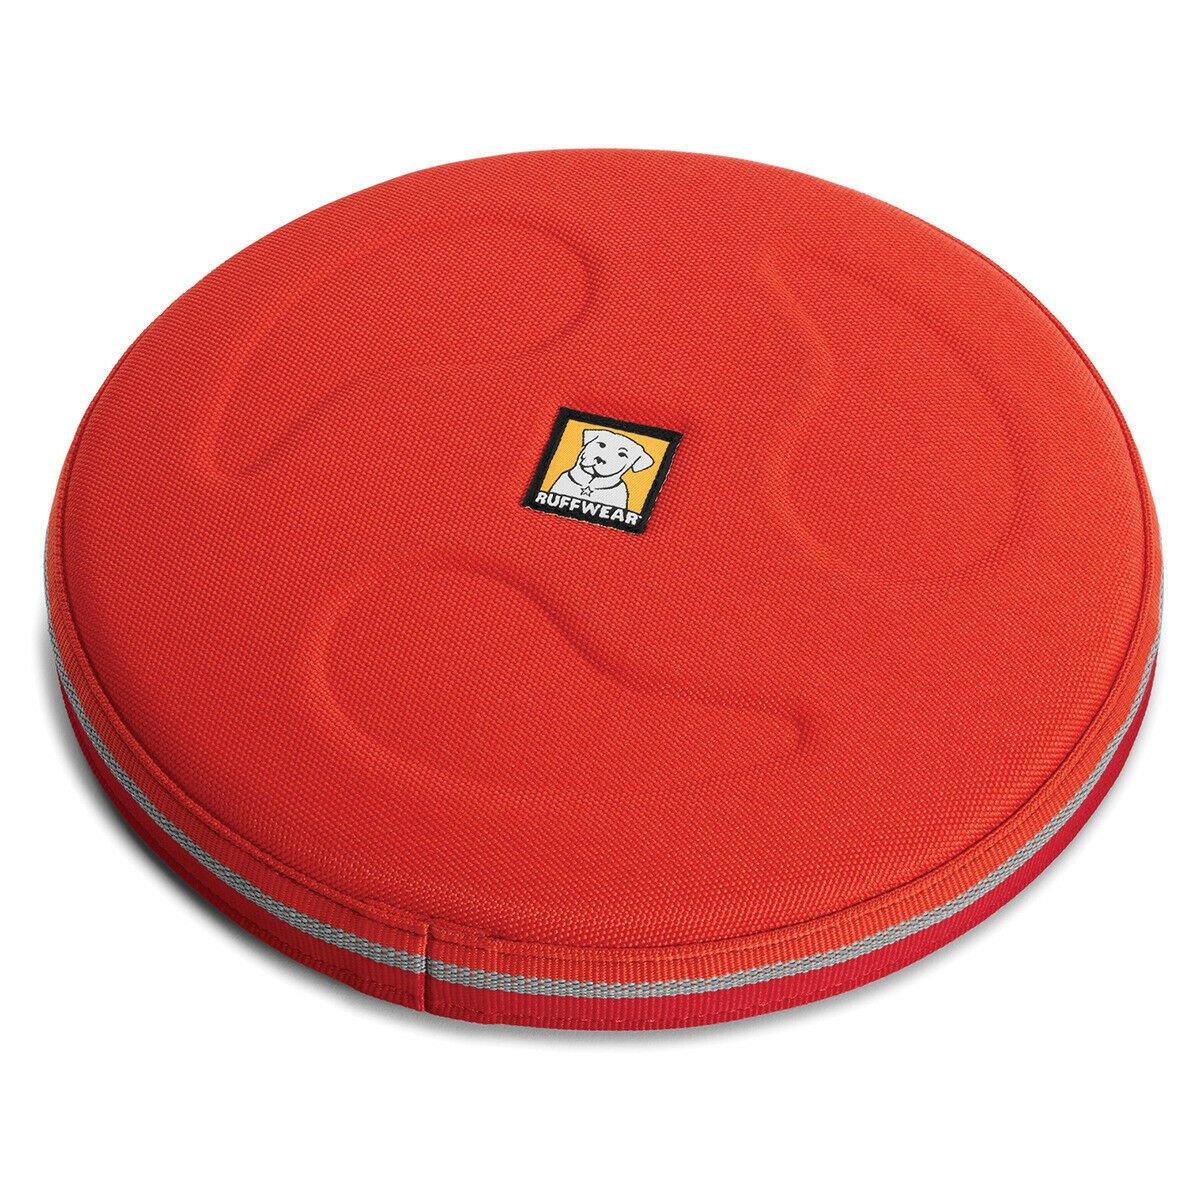 Ruffwear Hundespielzeug Hover Craft™ Frisbee, L, Sockeye Red - Ø 23 cm